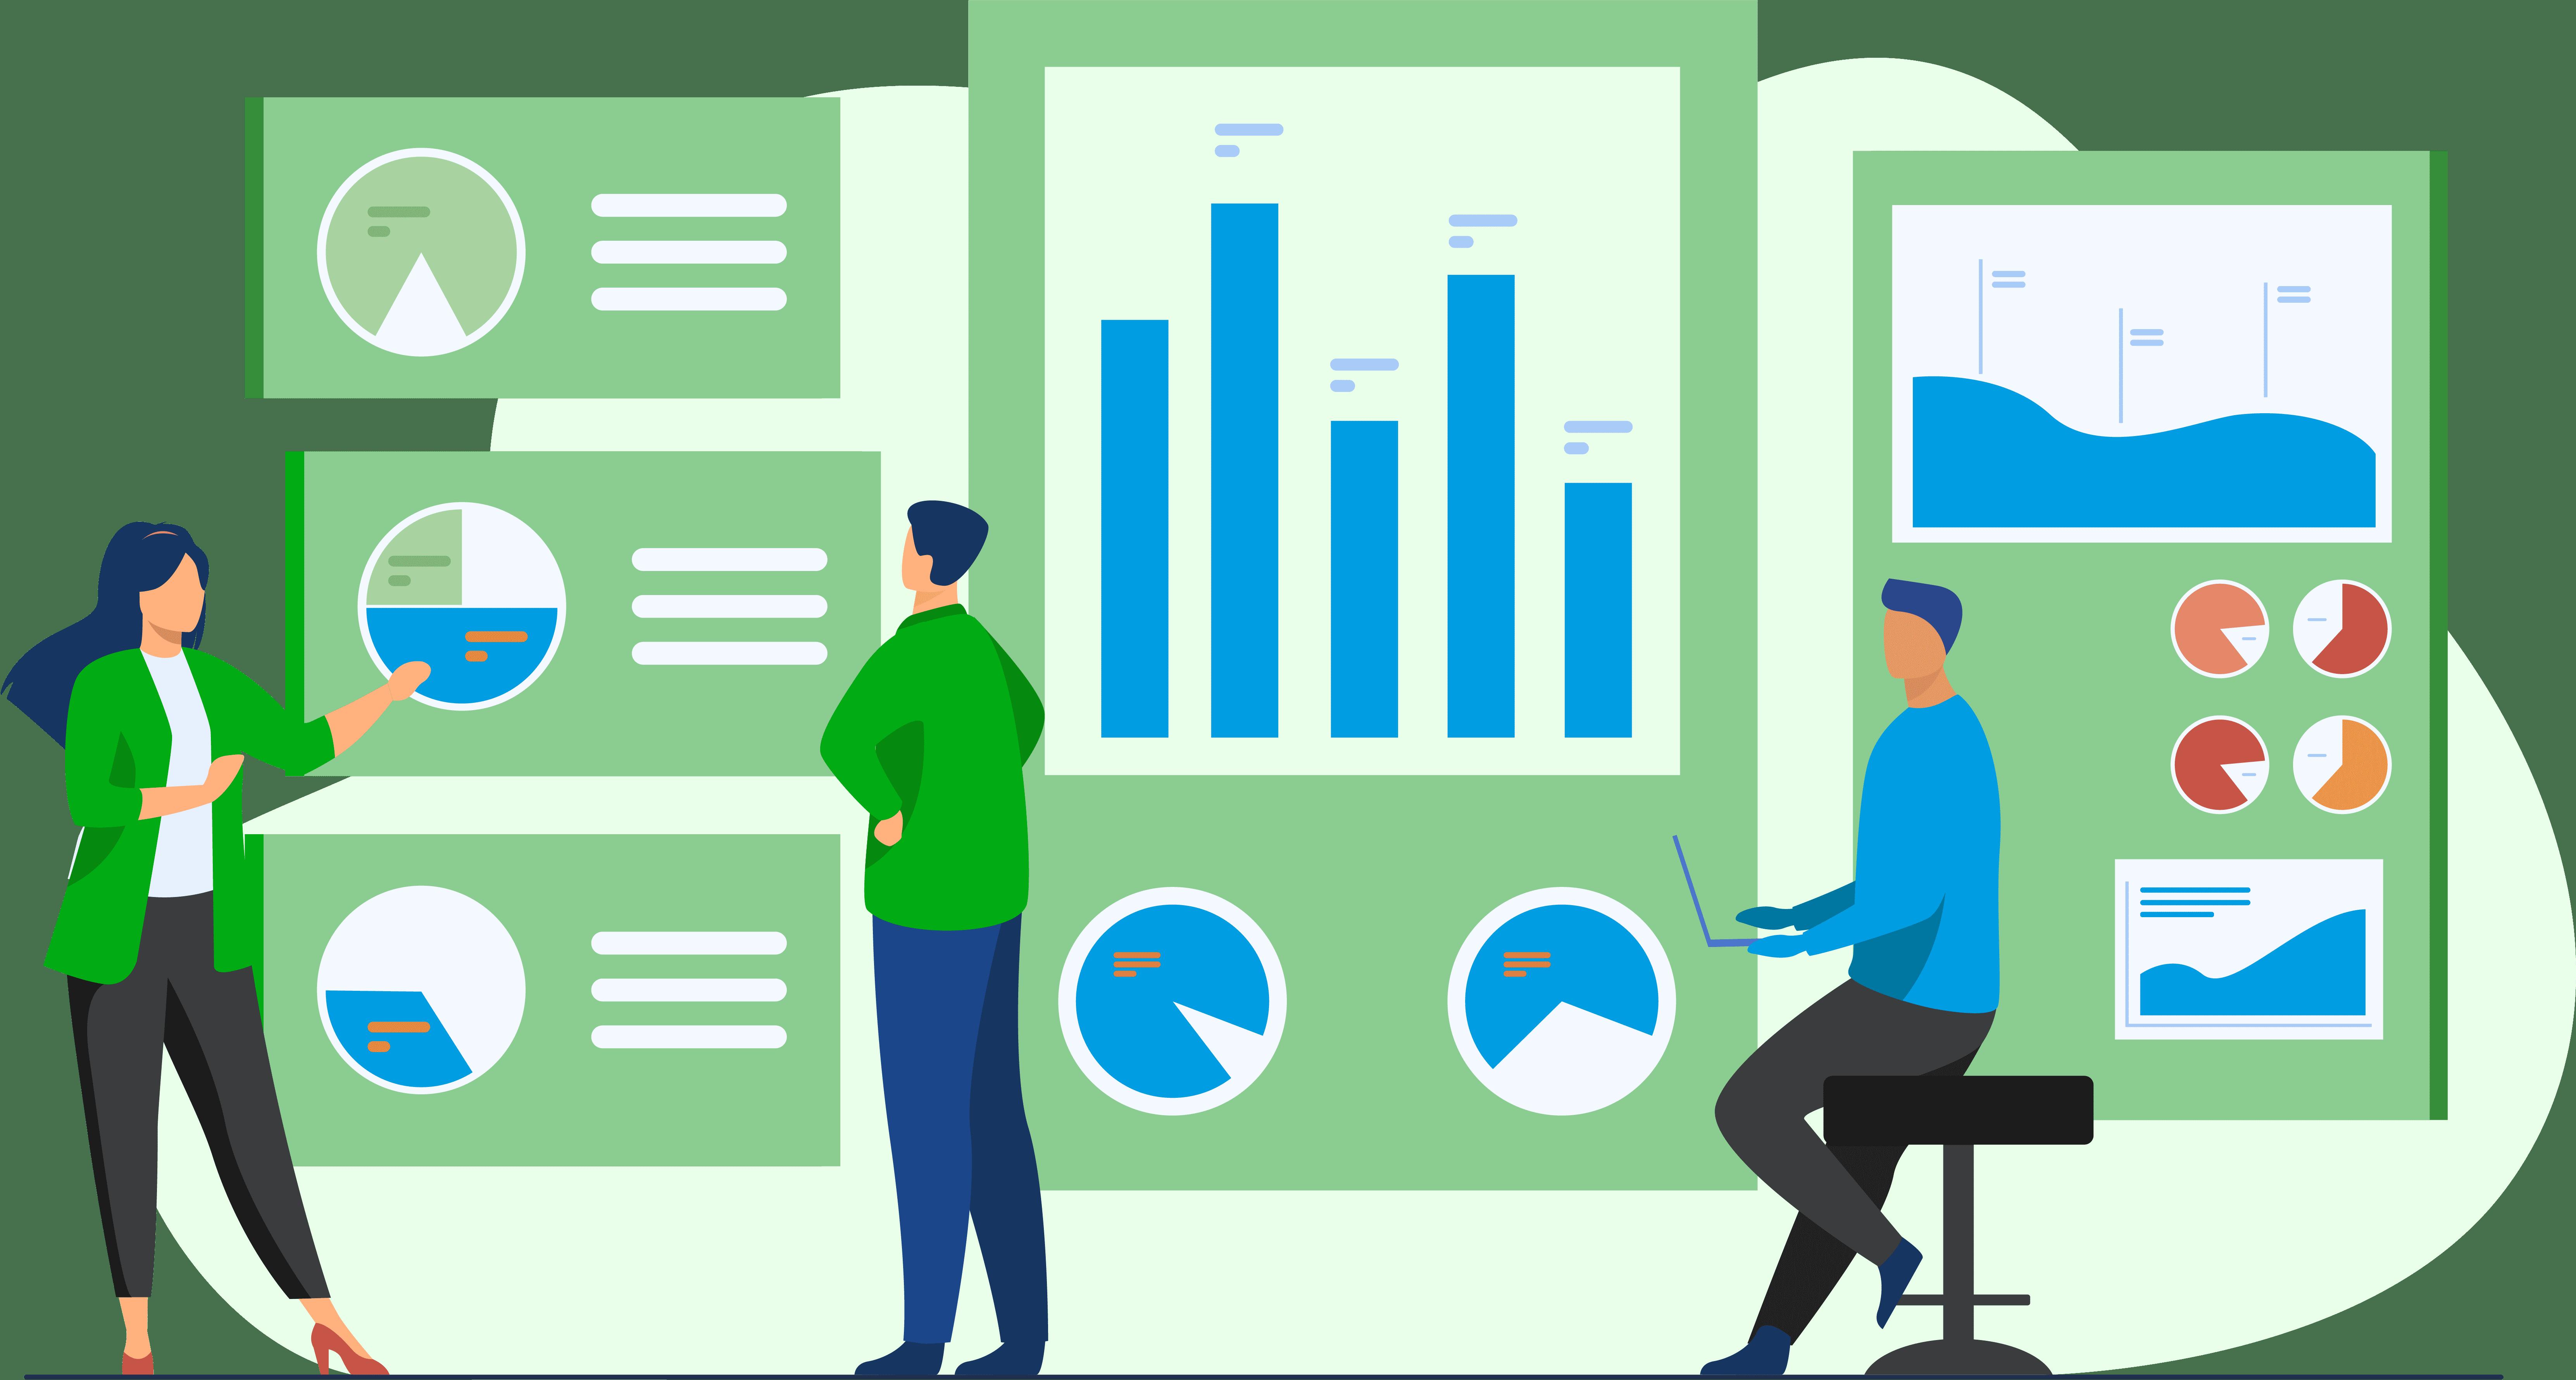 Illustration of analytics